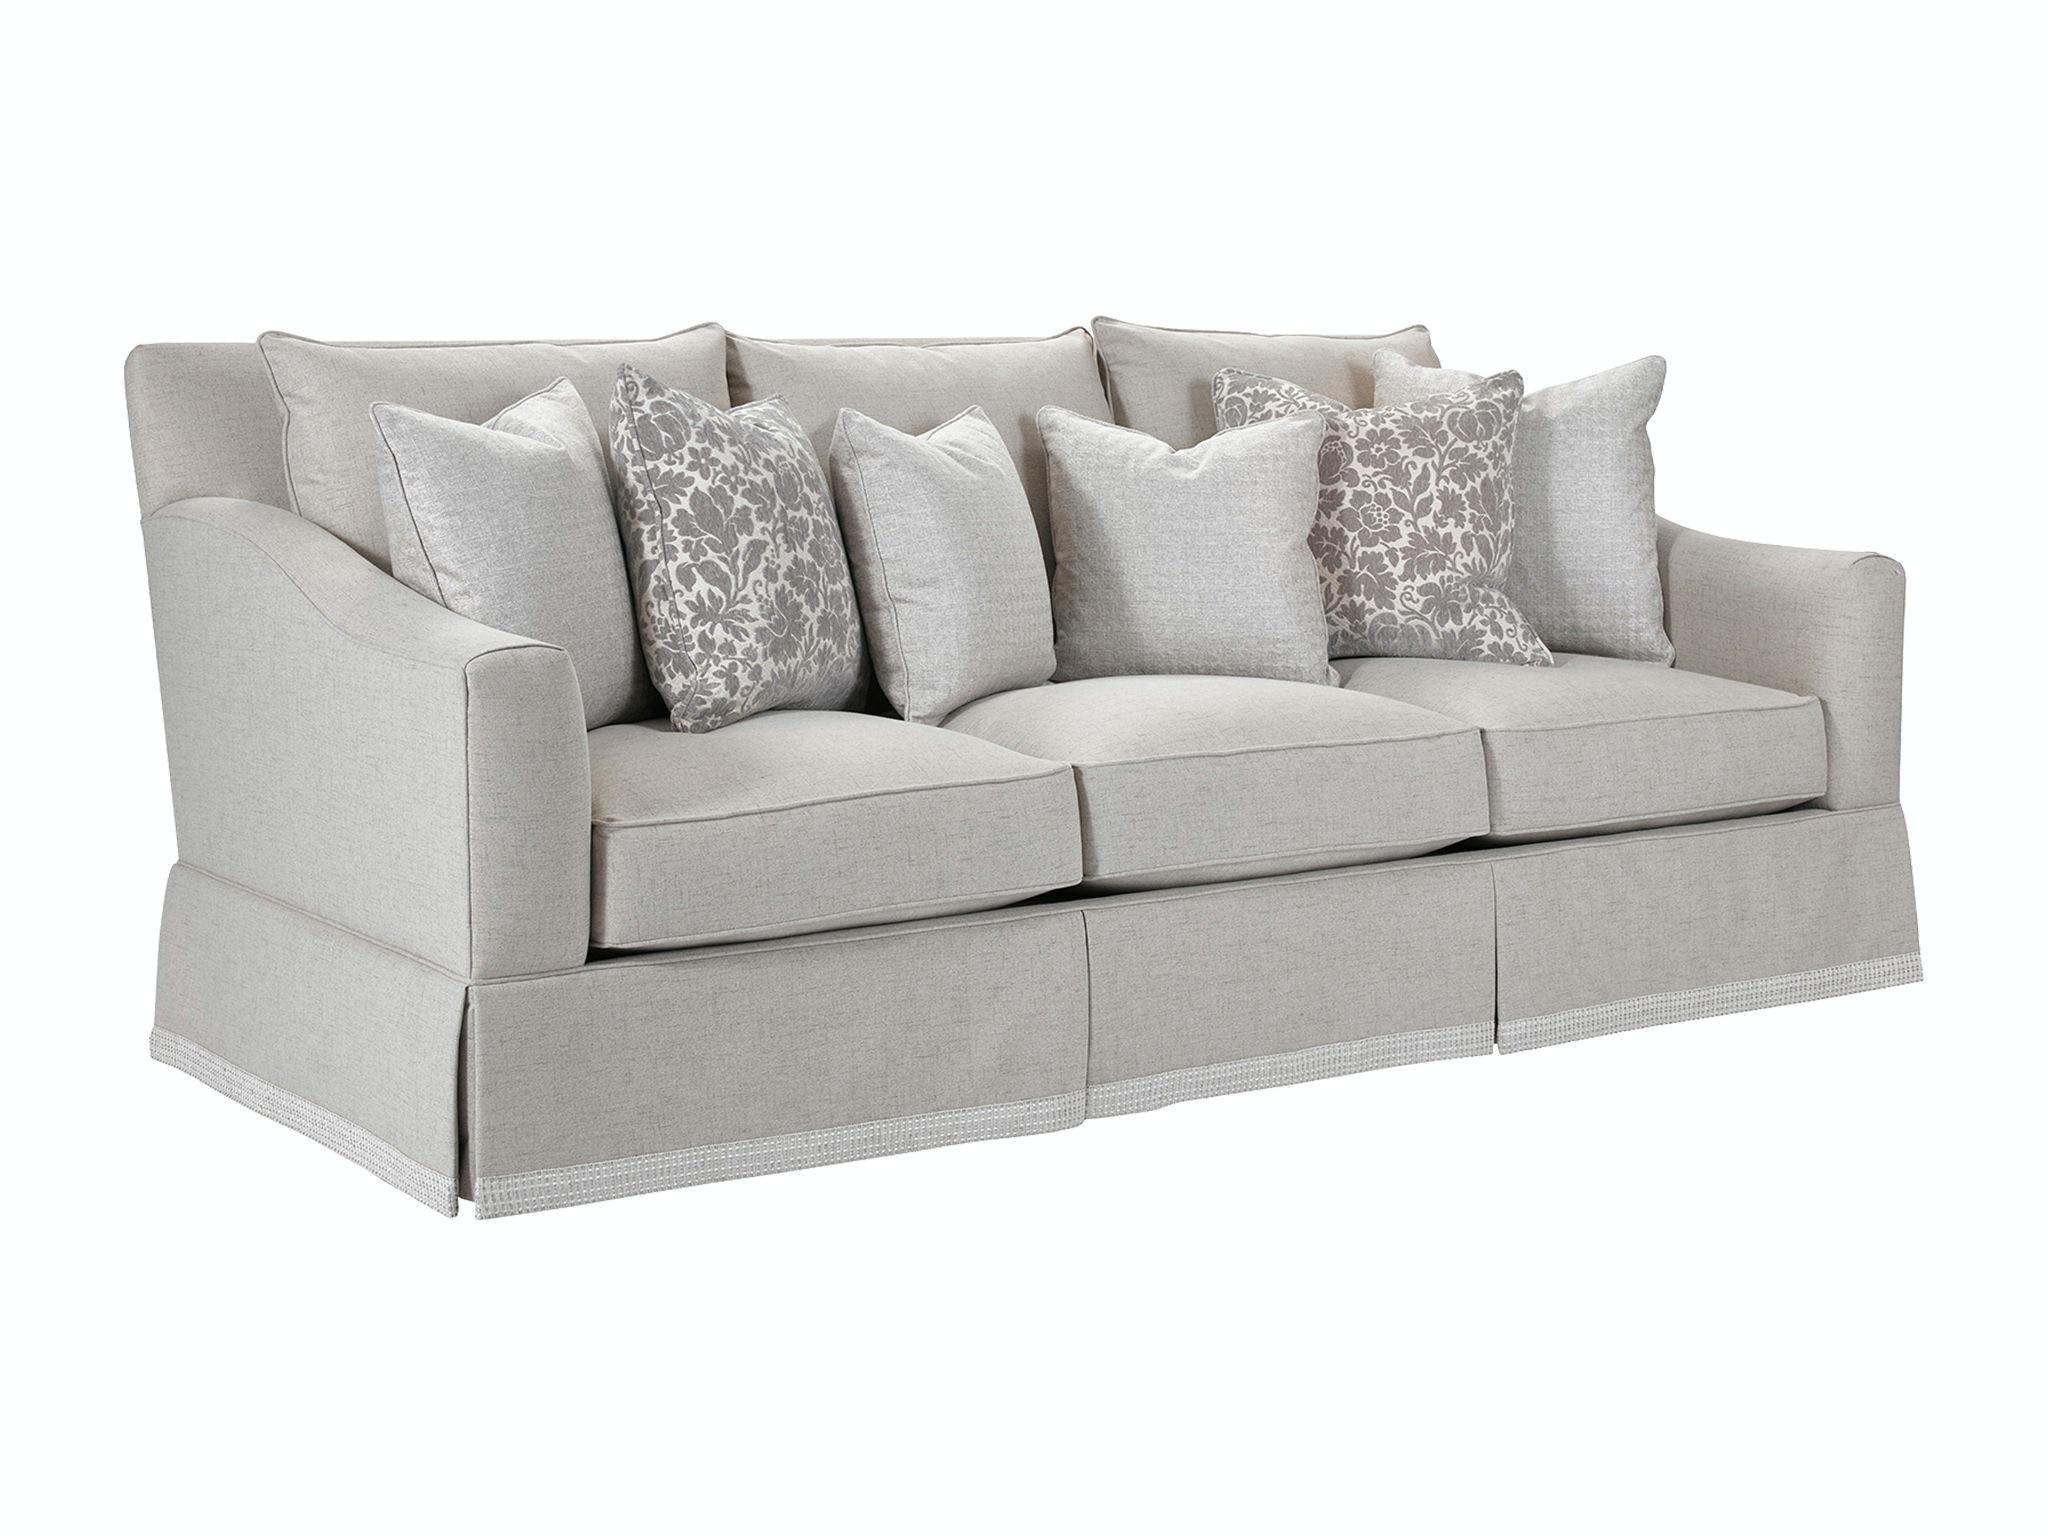 Incroyable Broyhill Regina Sofa With Border Skirt 4284 3B